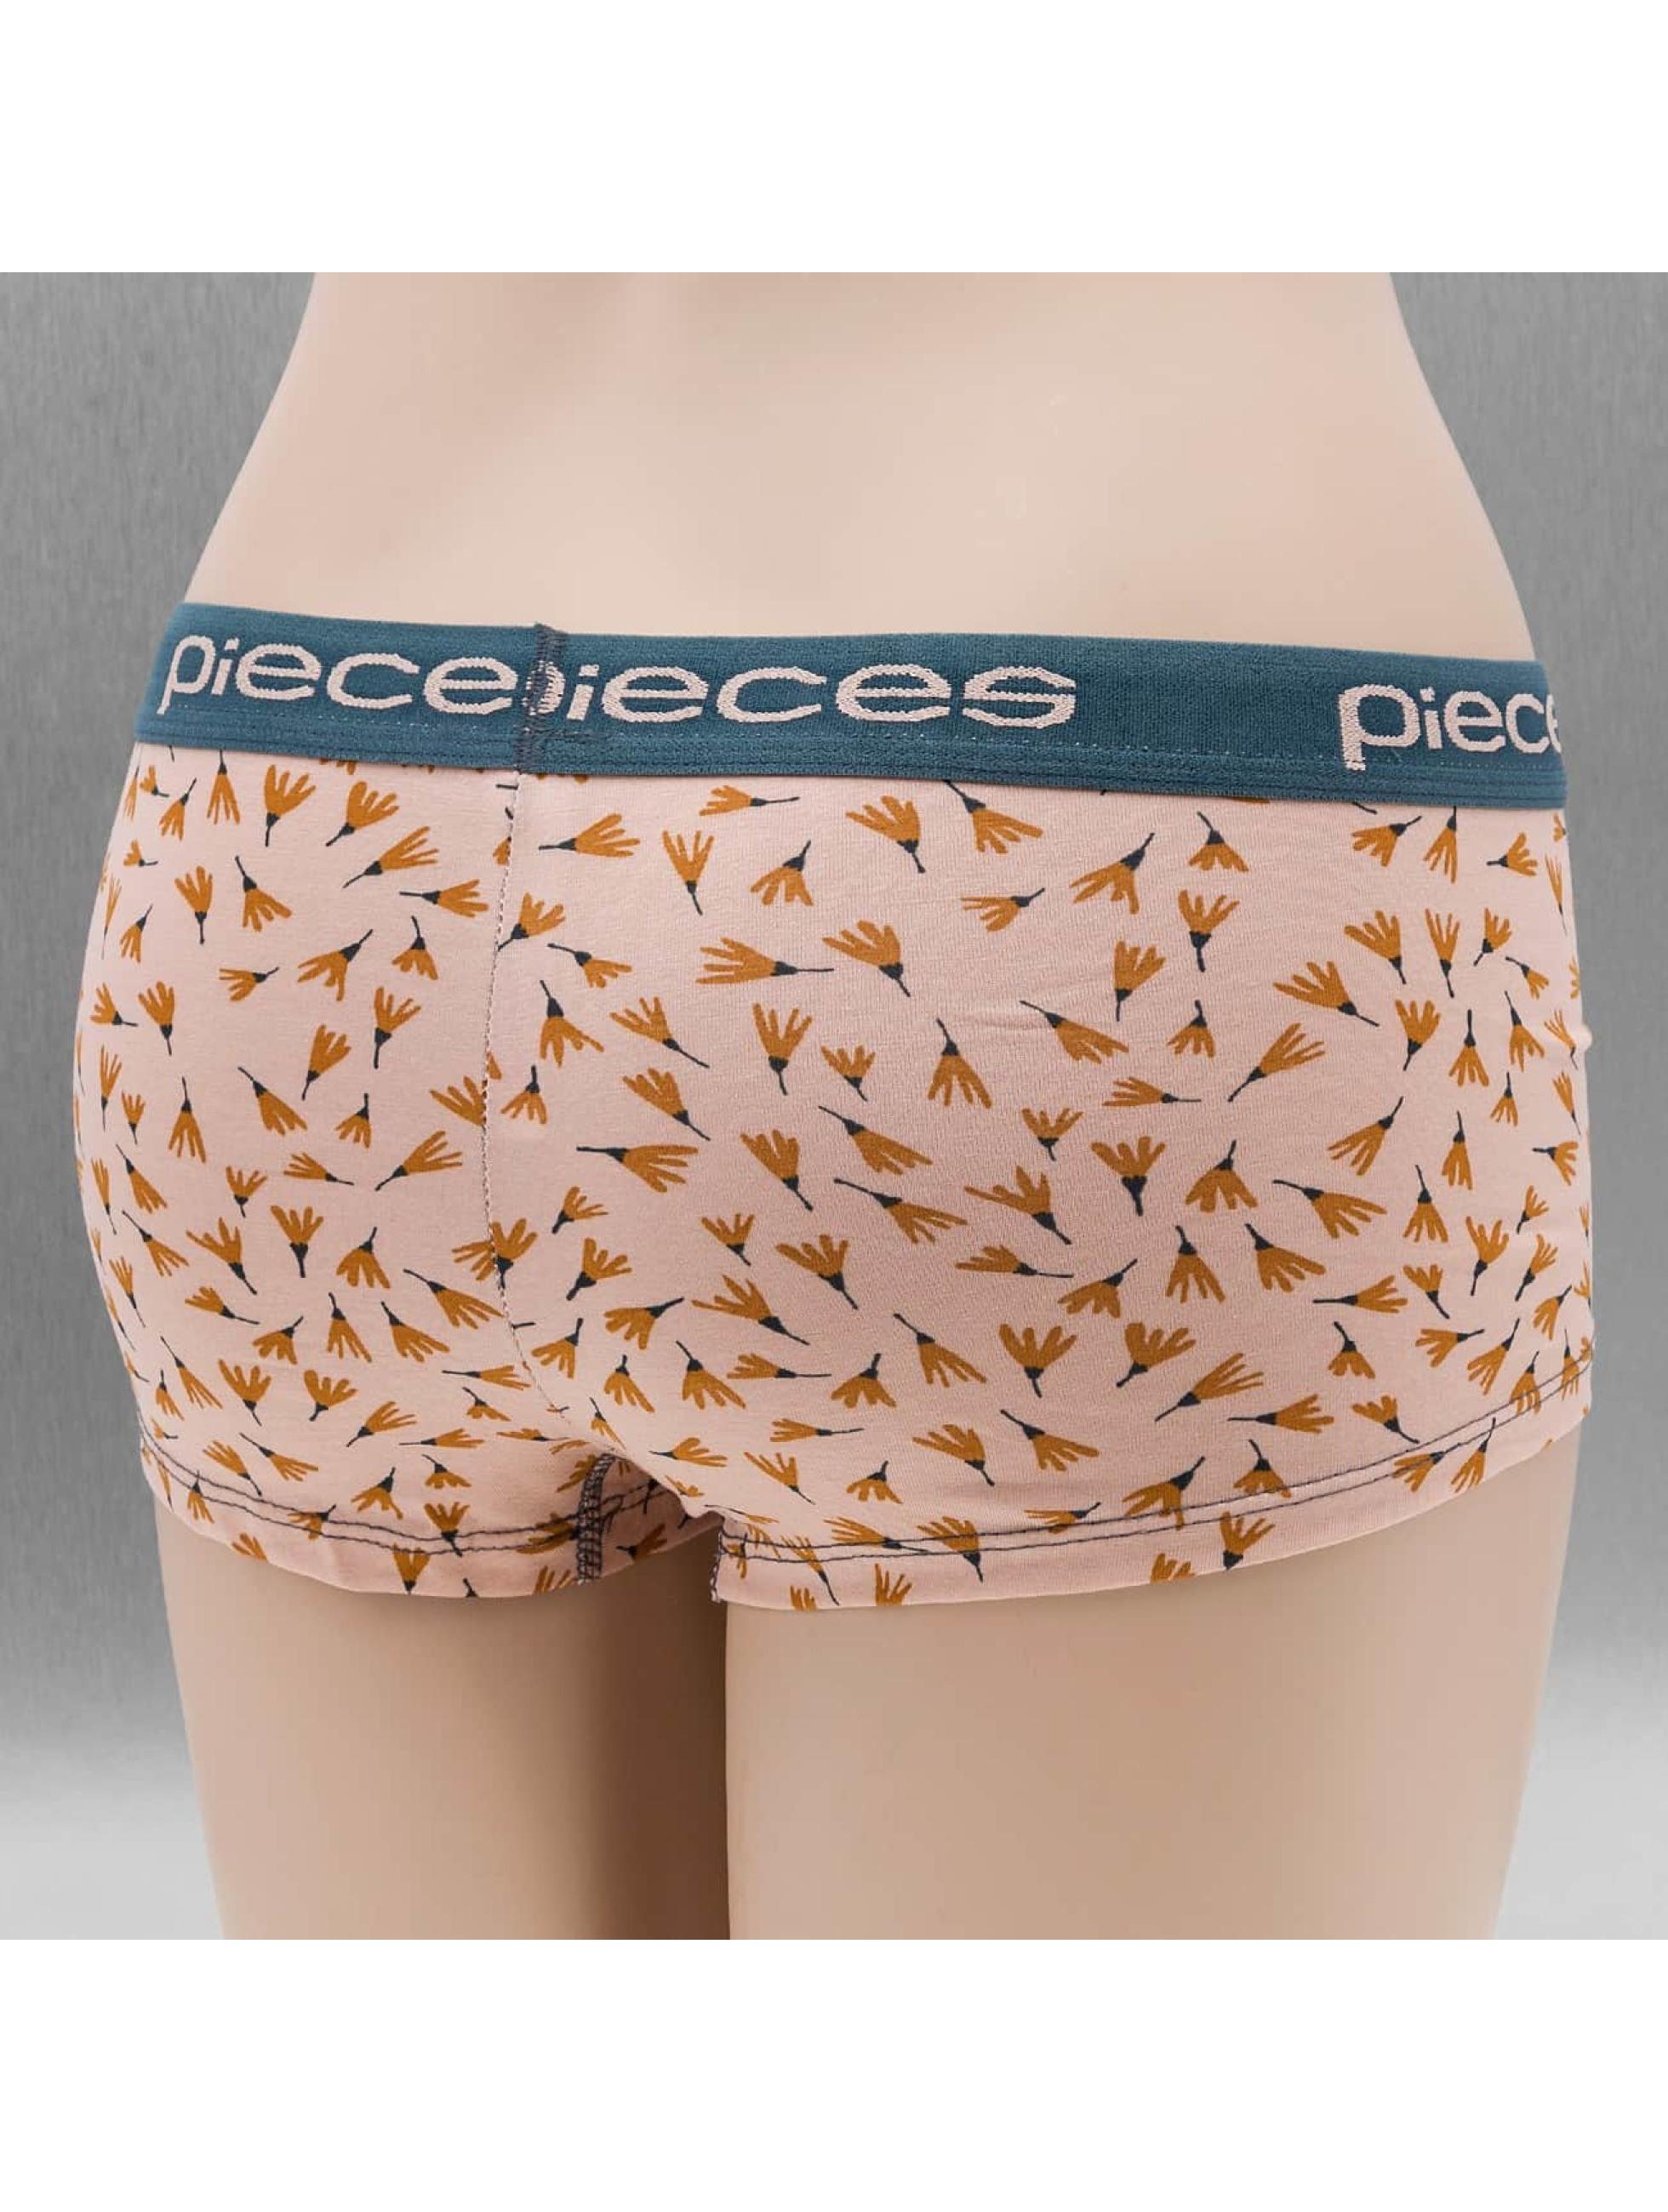 Pieces Underwear PClogo rose